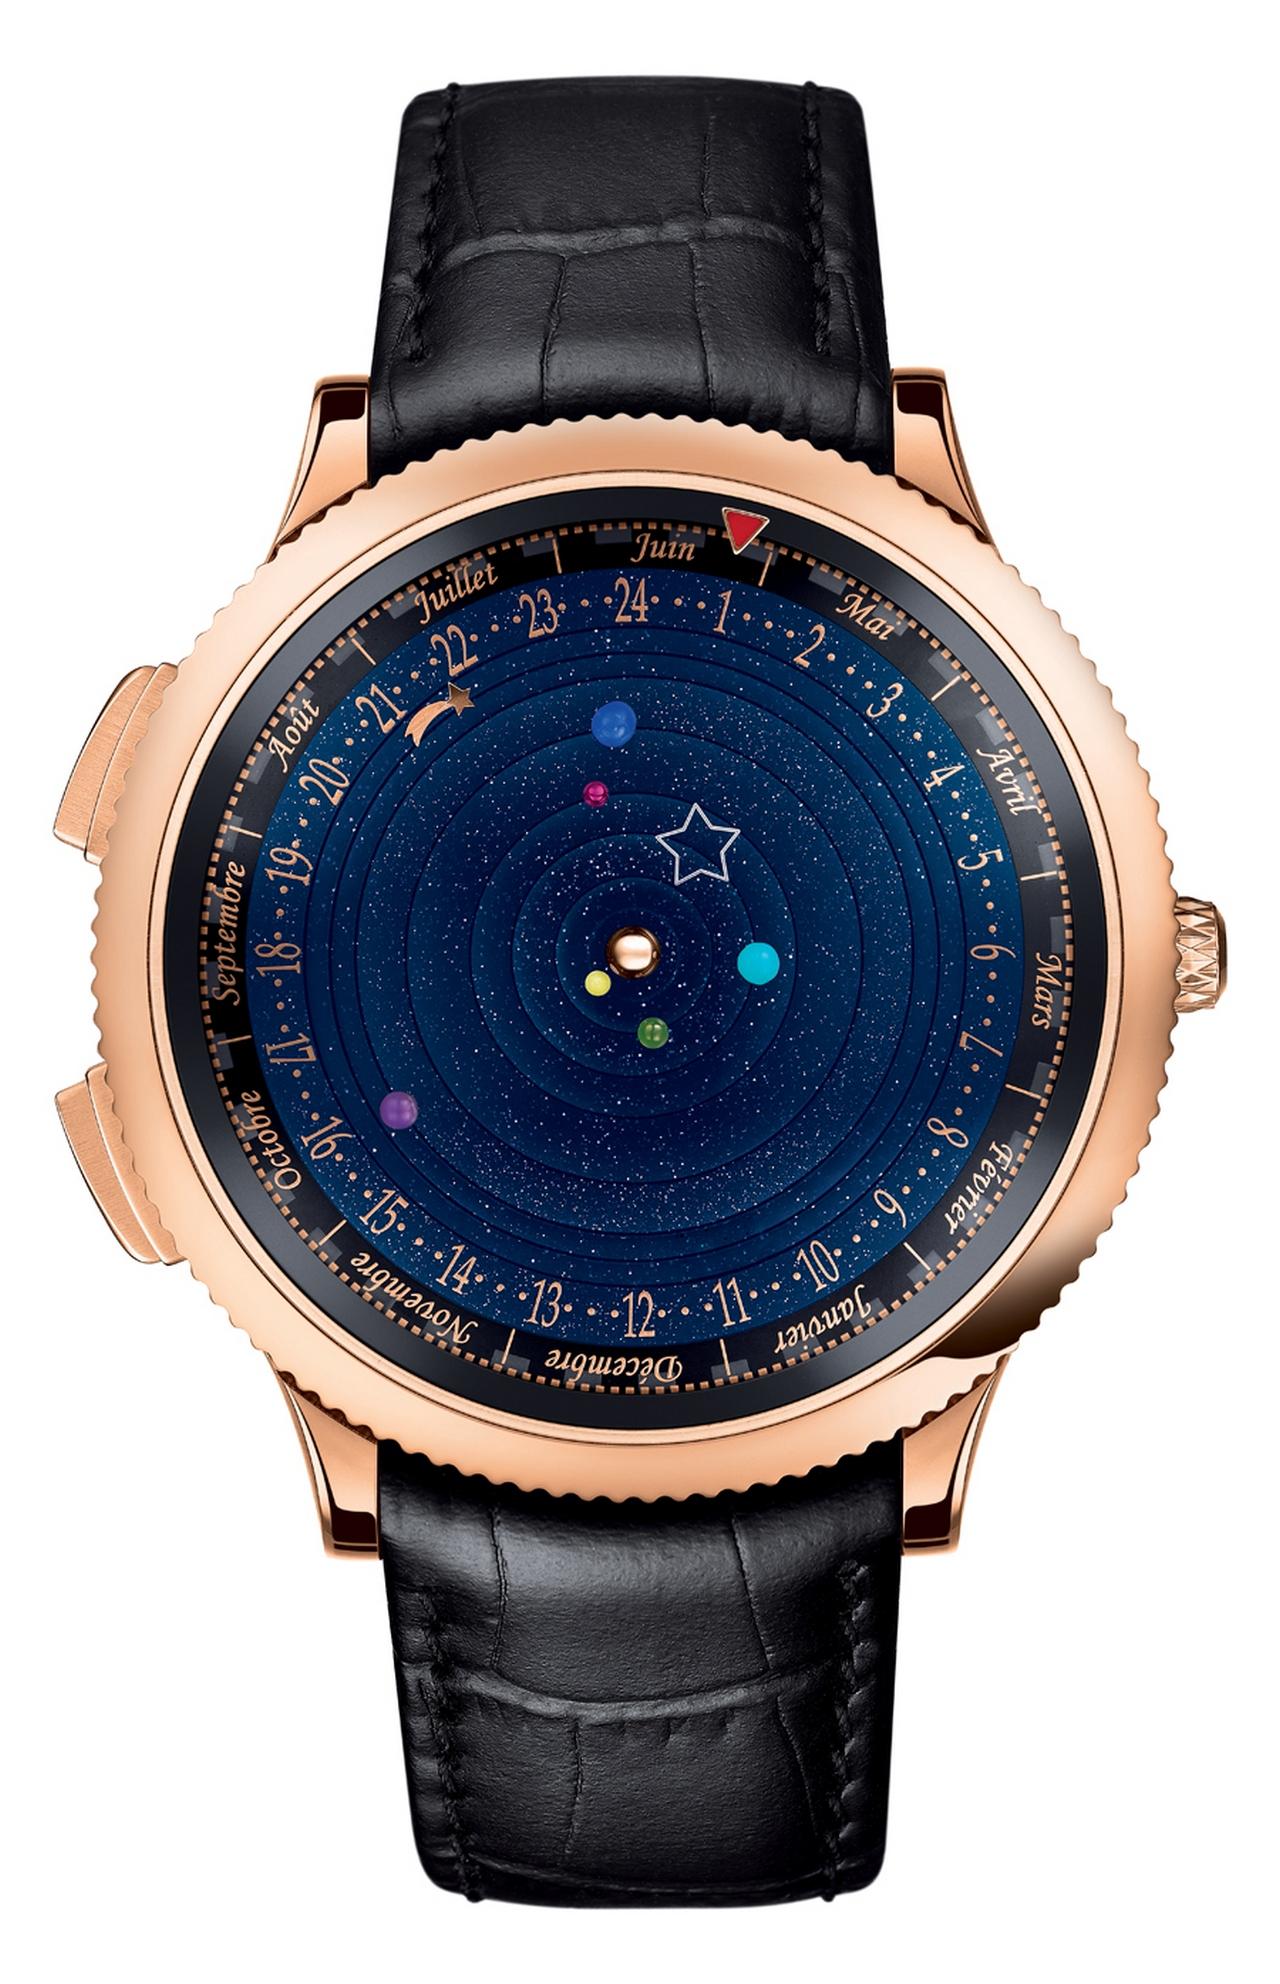 van-cleef-arpels-midnight-planetarium-poetic-complication-prezzo-price_0-100_1